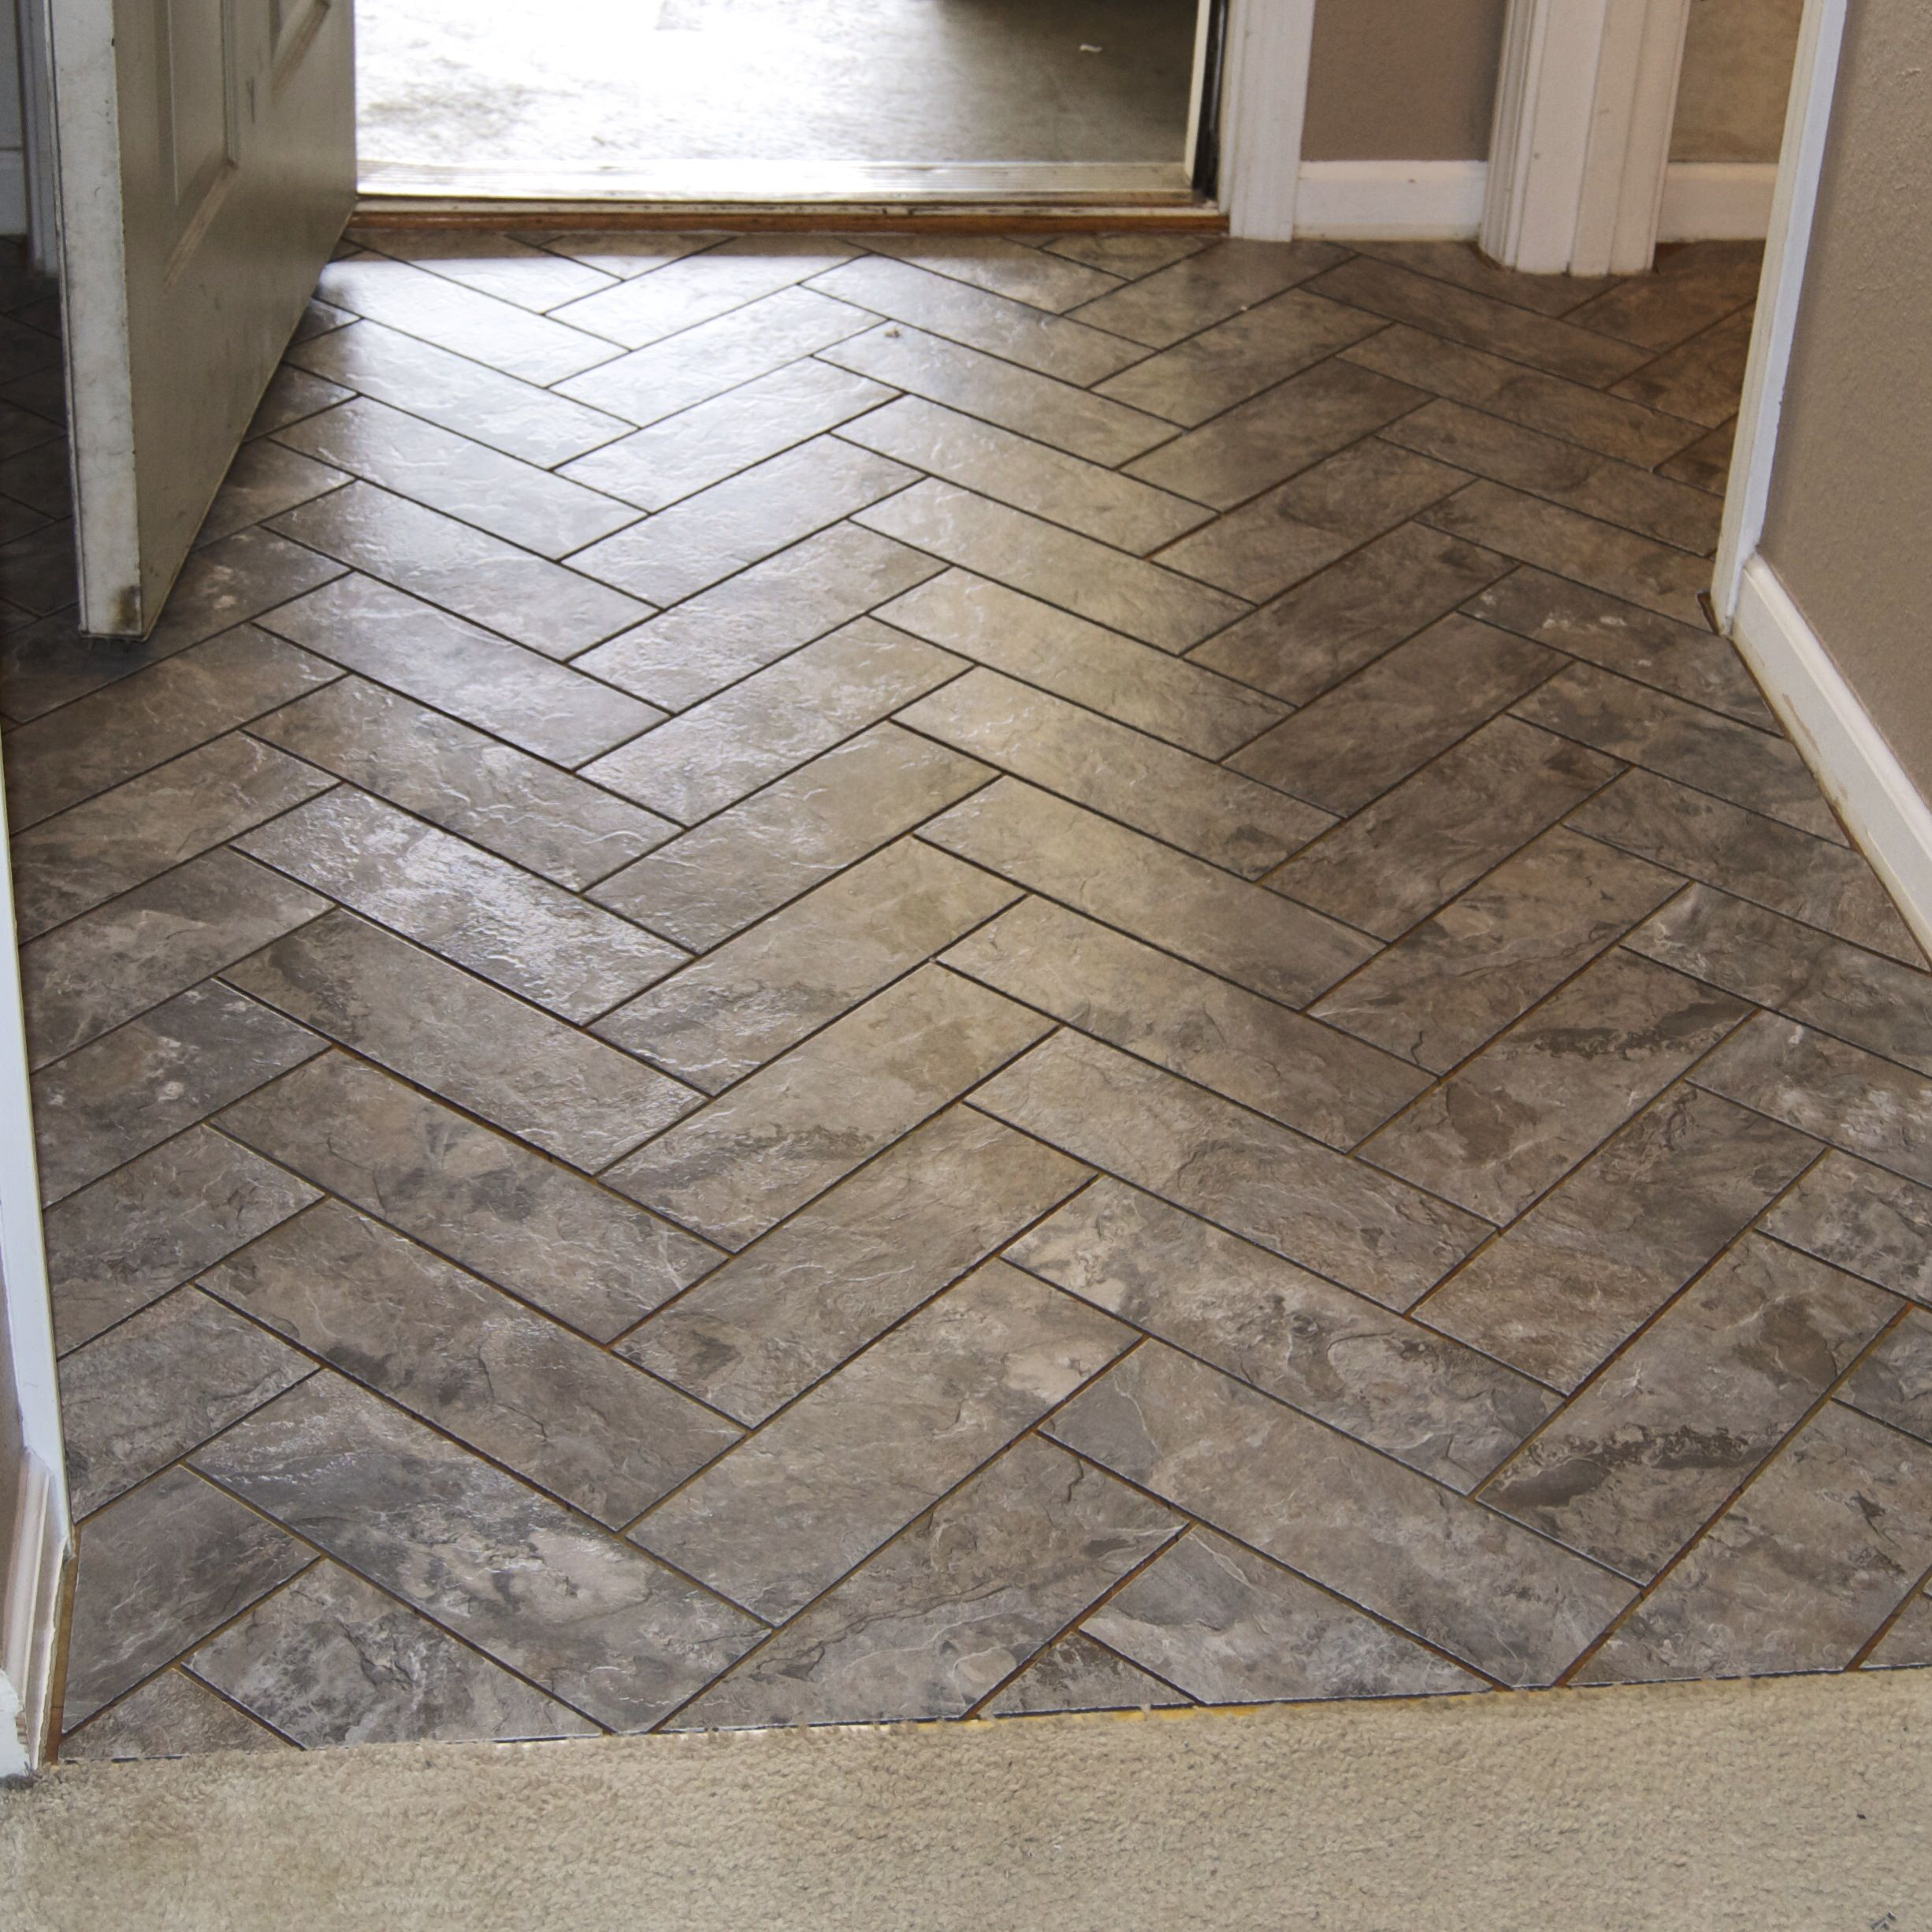 Herringbone vinyl tile pattern via grace gumption bathroom herringbone vinyl tile pattern via grace gumption dailygadgetfo Choice Image